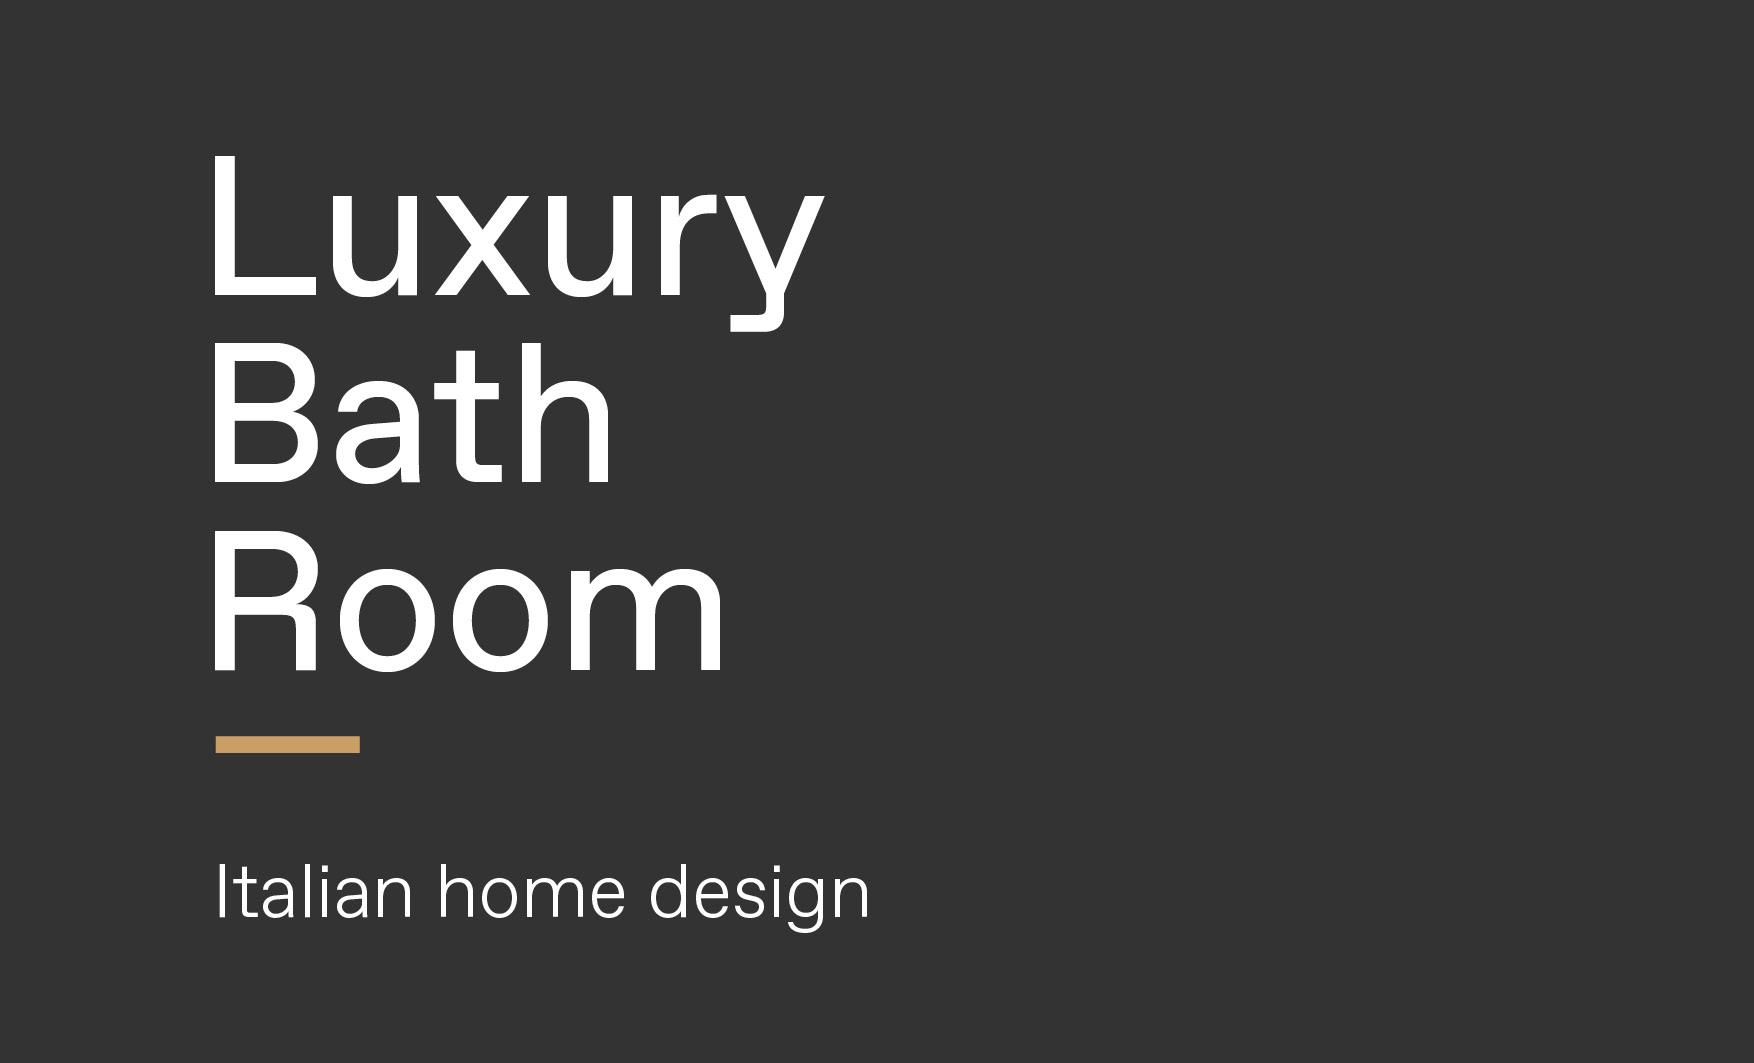 Concept of luxury Italian style bathroom made by Esperiri team